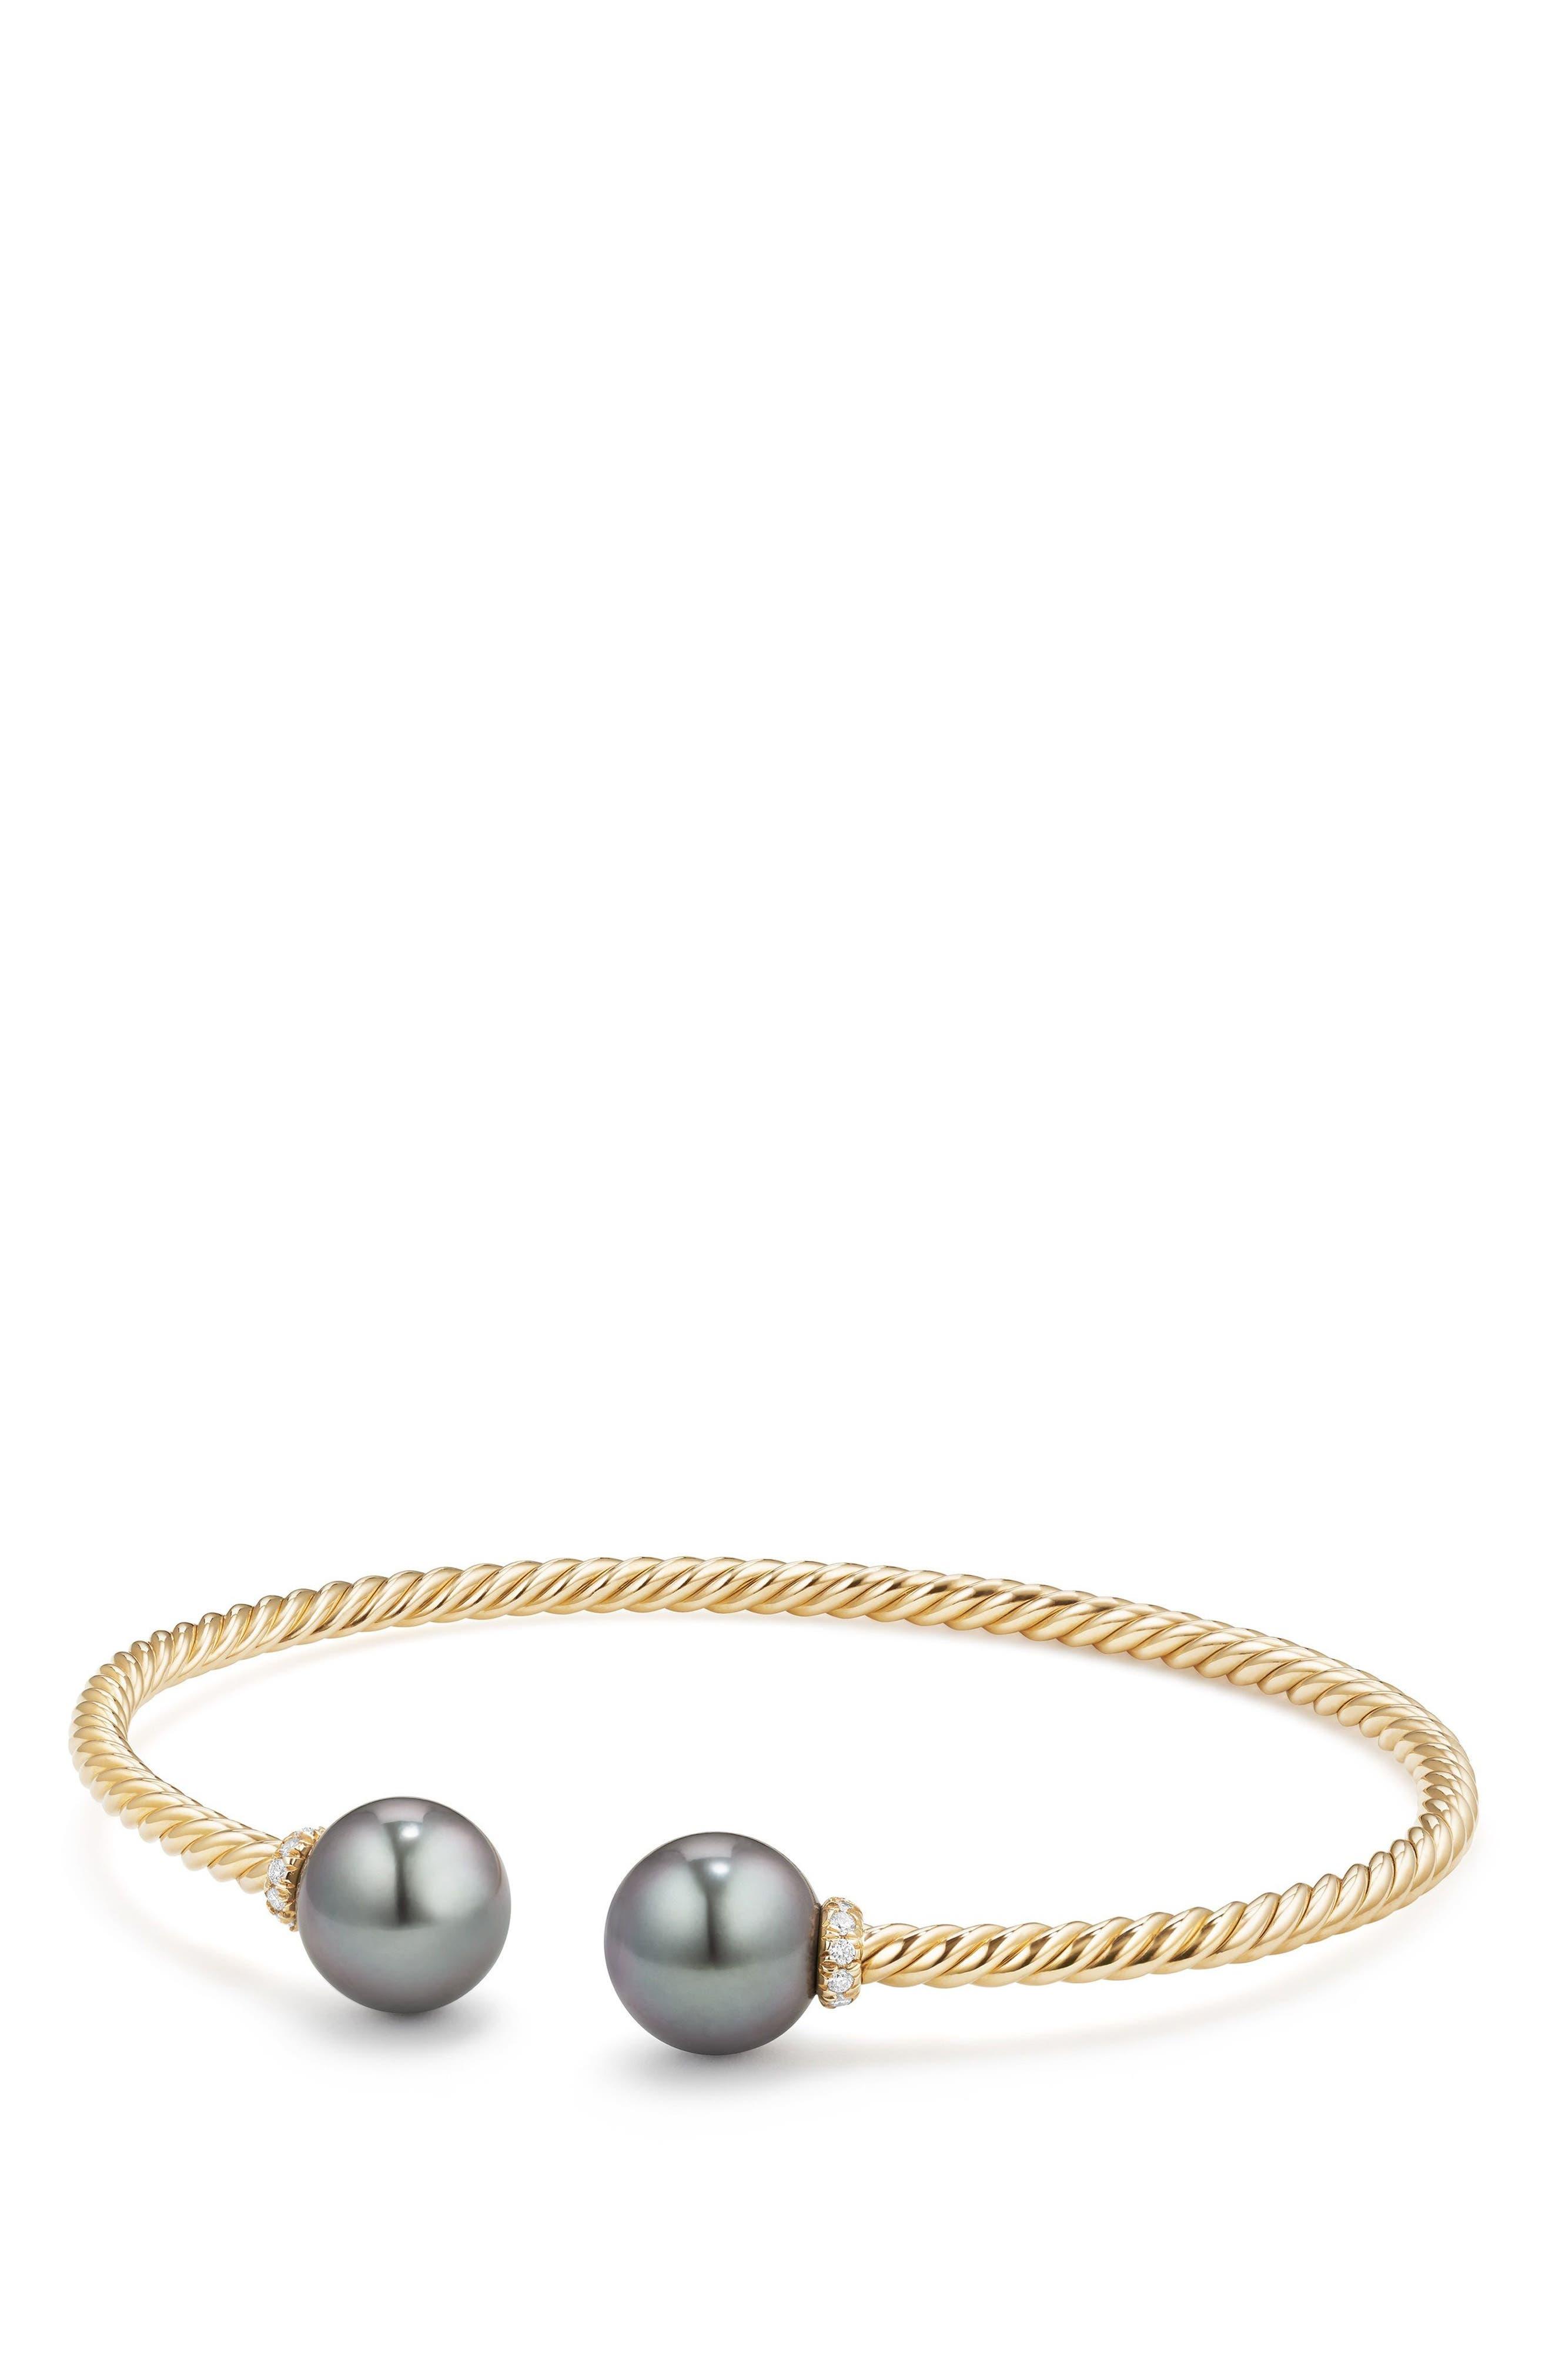 Alternate Image 1 Selected - David Yurman Solari Bead Bracelet with Diamonds